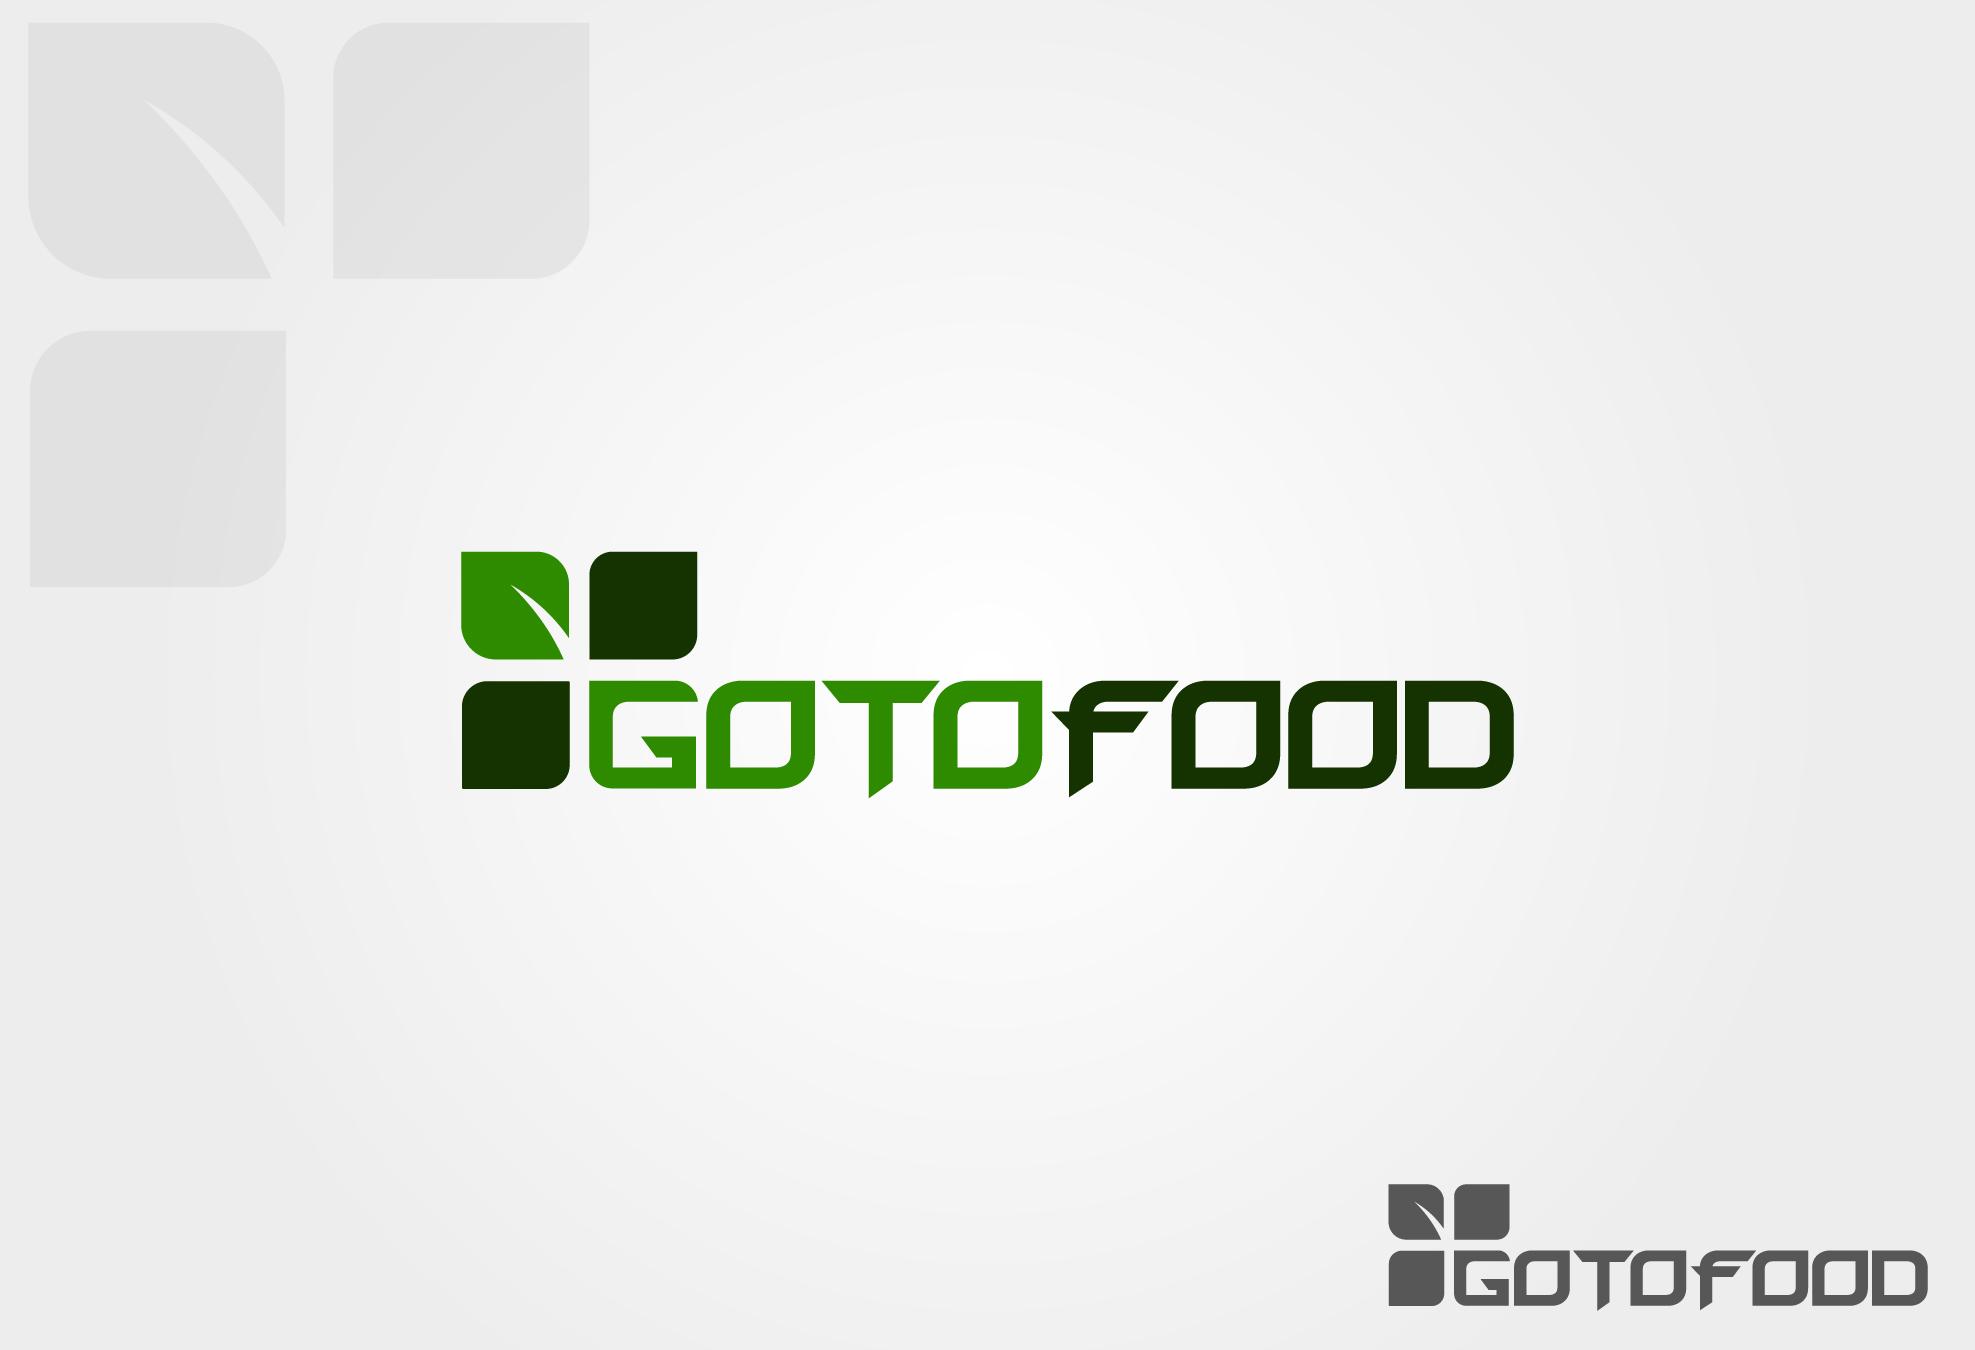 Логотип интернет-магазина здоровой еды фото f_8405cd3f6e705f52.jpg